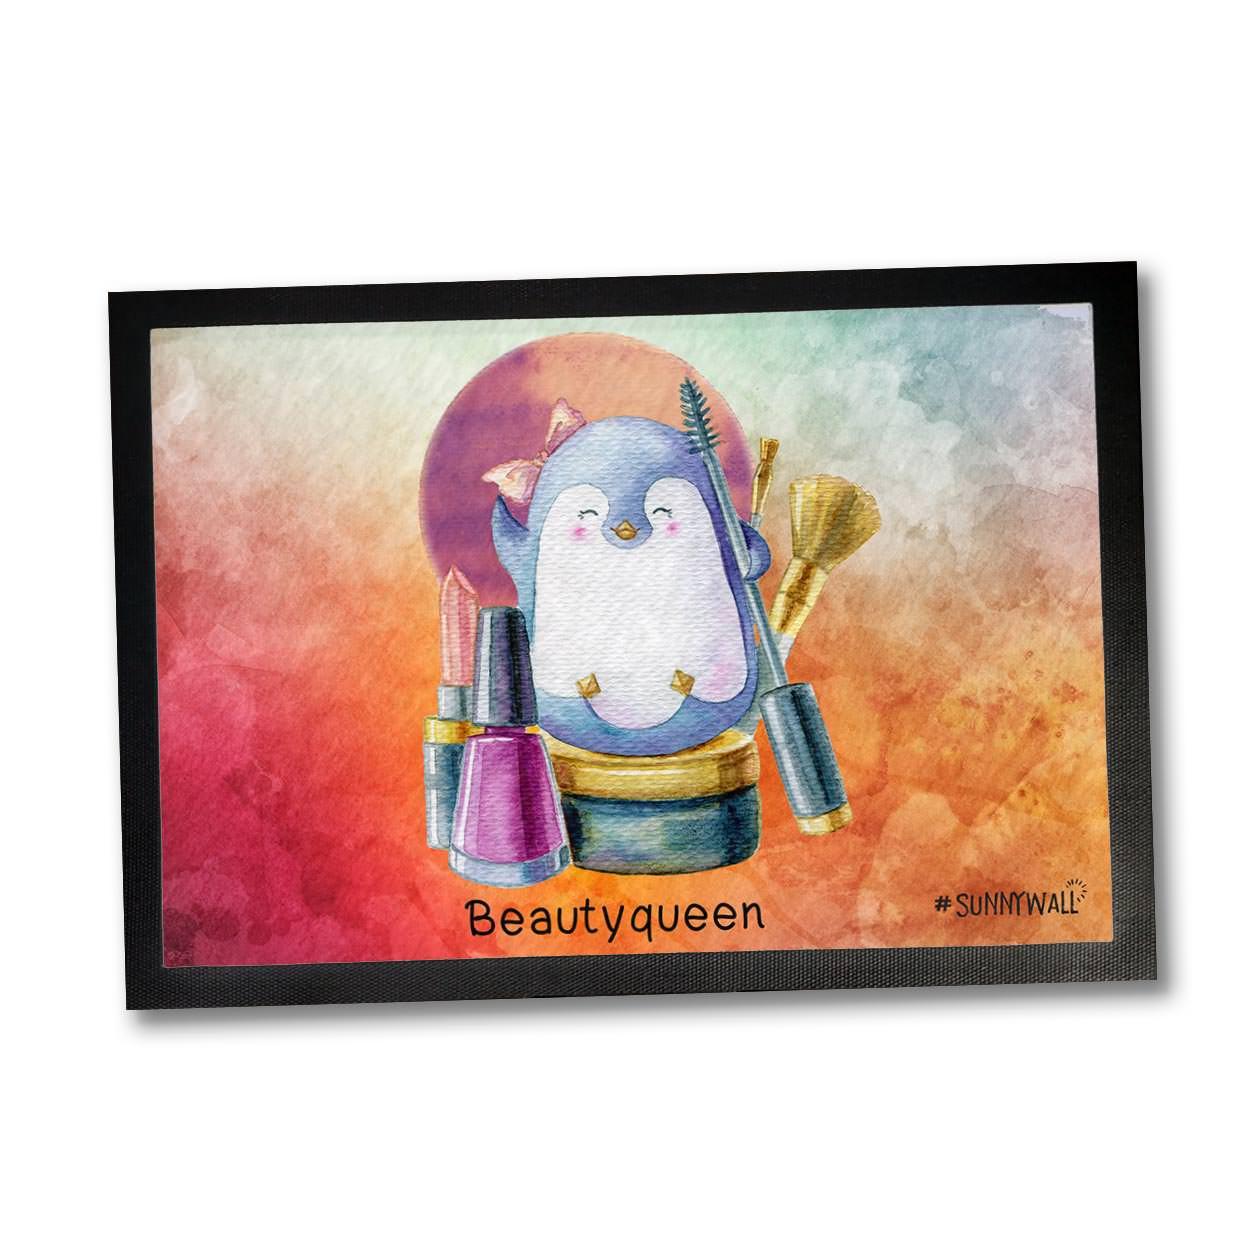 35 X 50 Fussmatte Pinguin Familie Nigel Beautyqueen Sunnywall